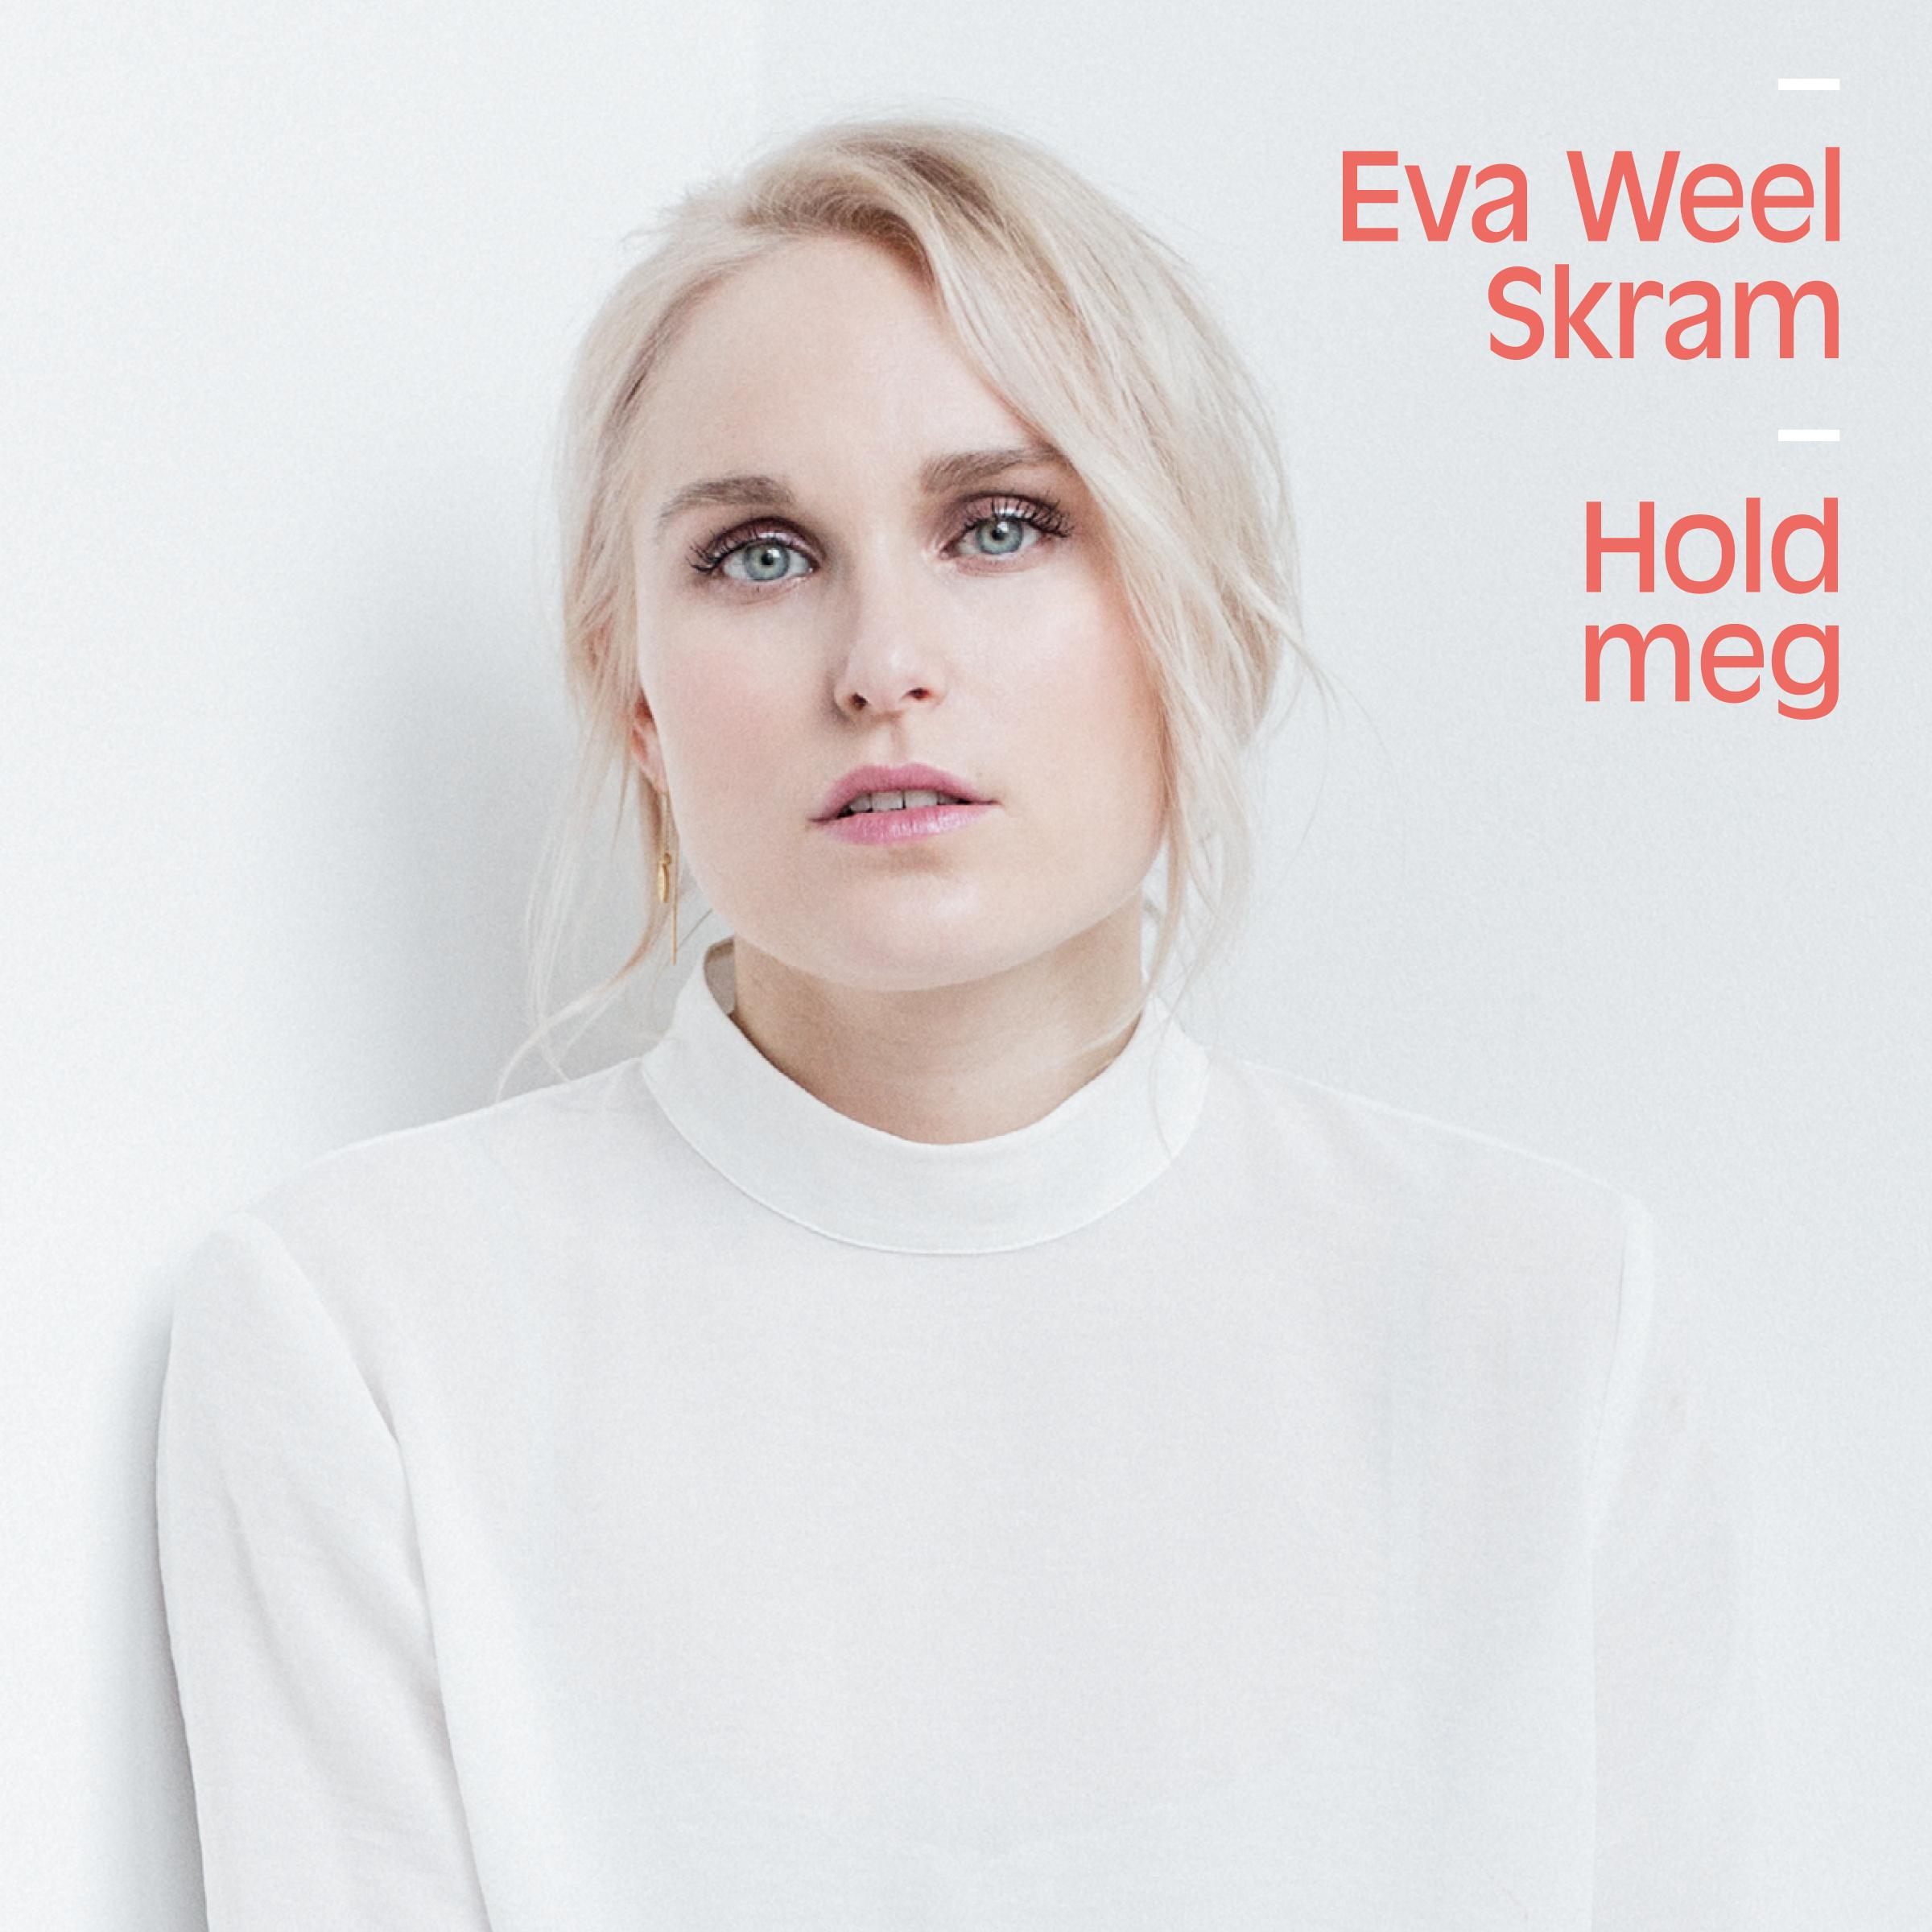 EVA WEEL SKRAM Hold meg